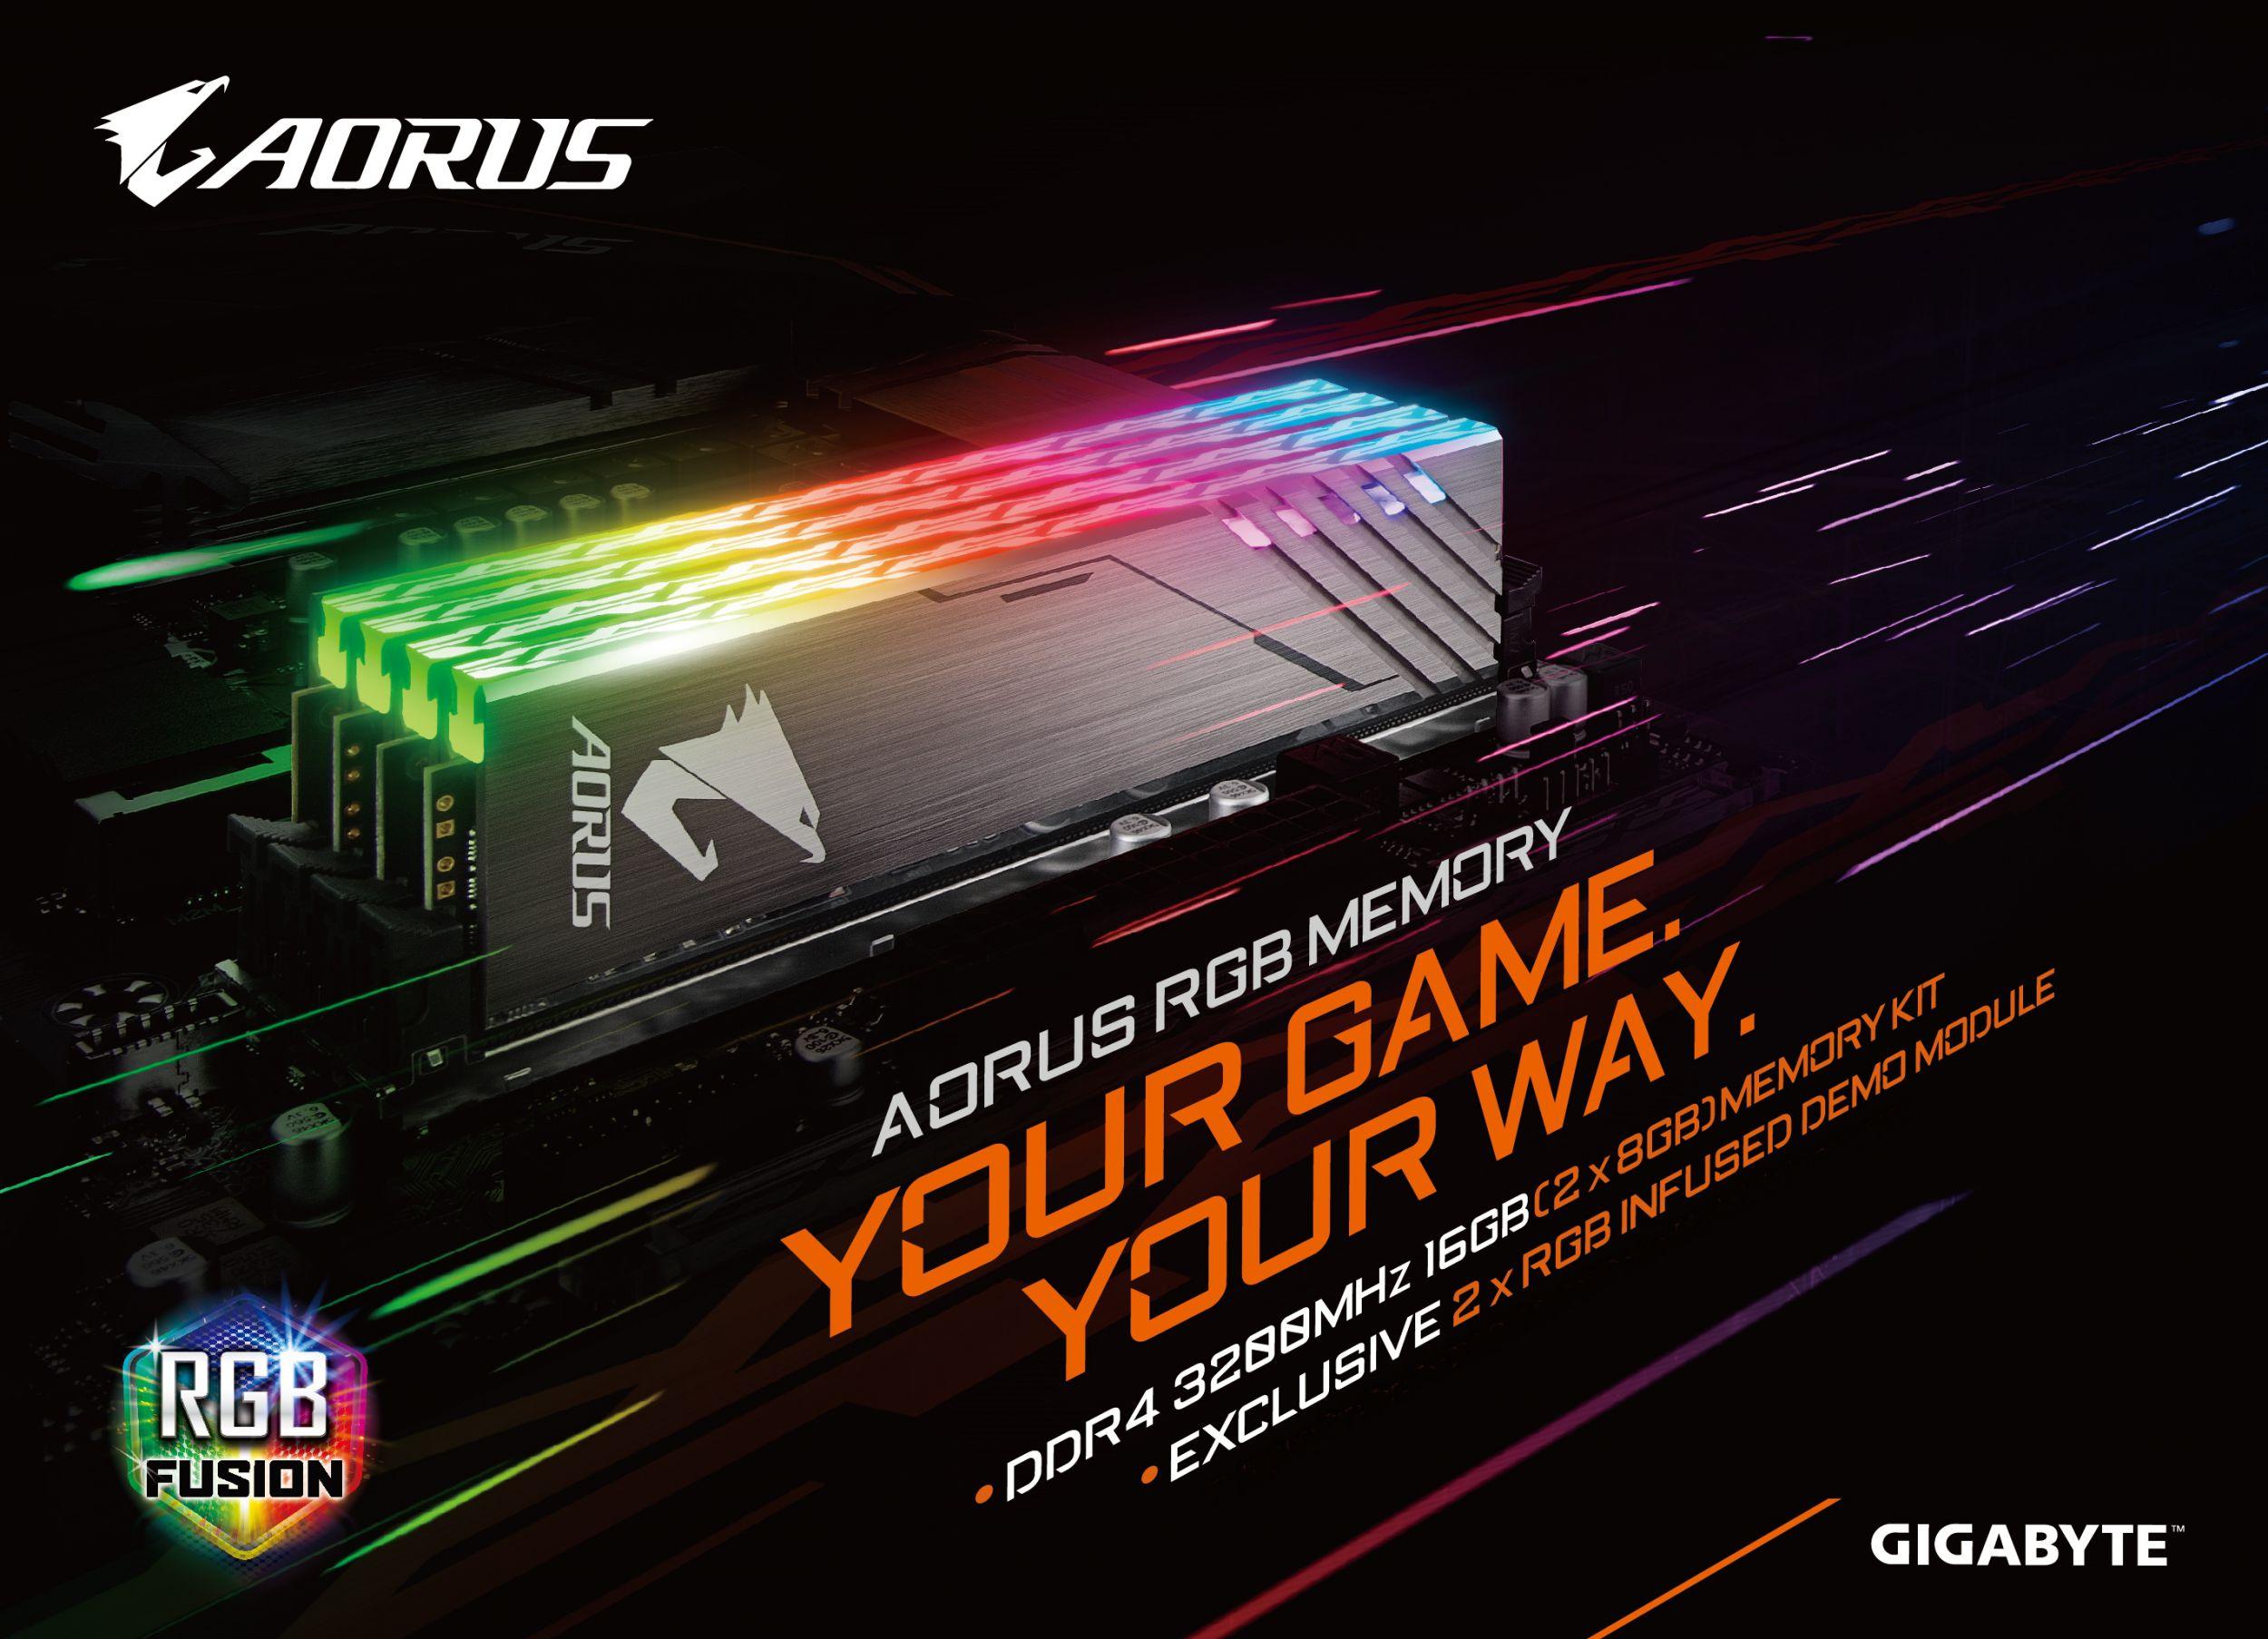 GIGABYTE Lights Up DRAM Market With AORUS RGB Memory | AORUS